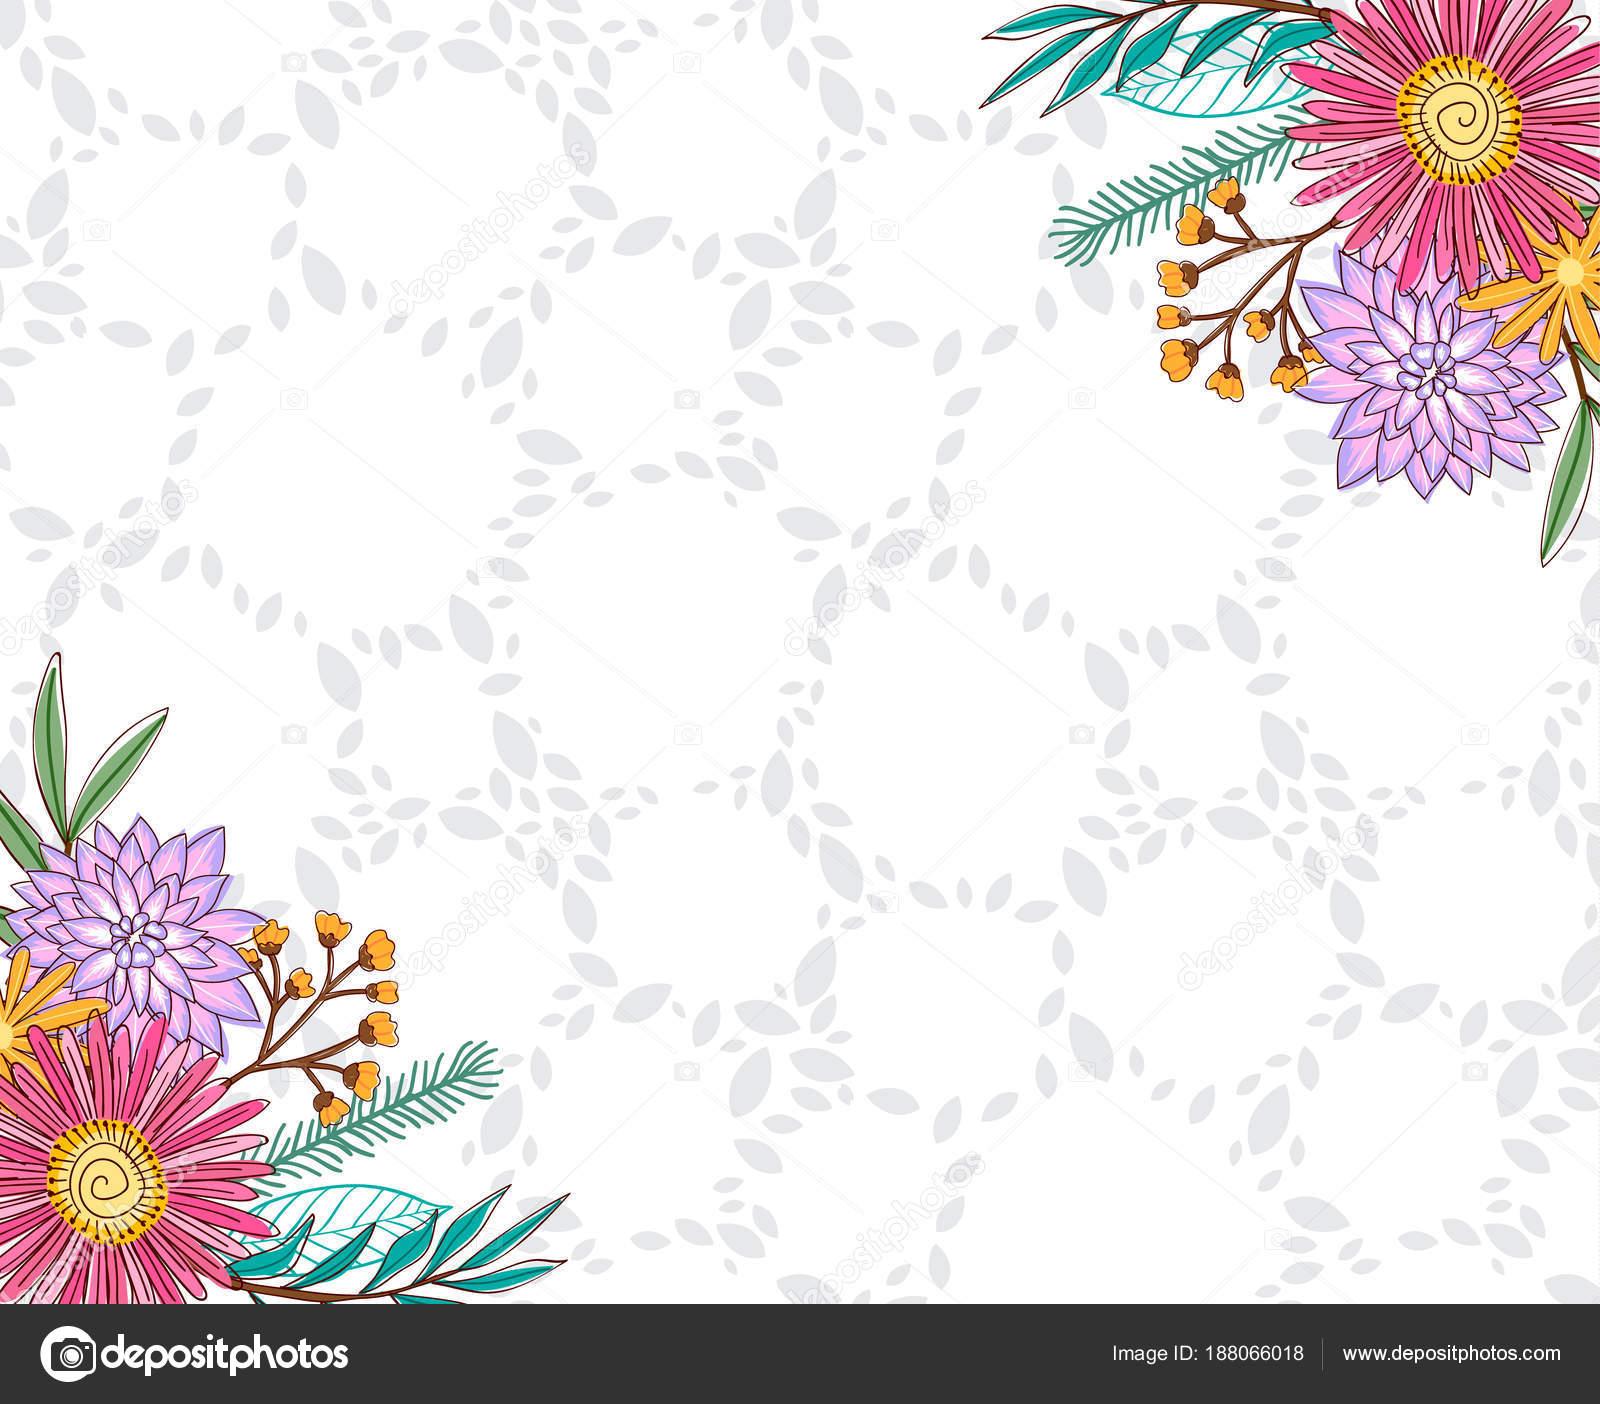 Fond Floral Dessin Floral Anniversaire Mariage Image